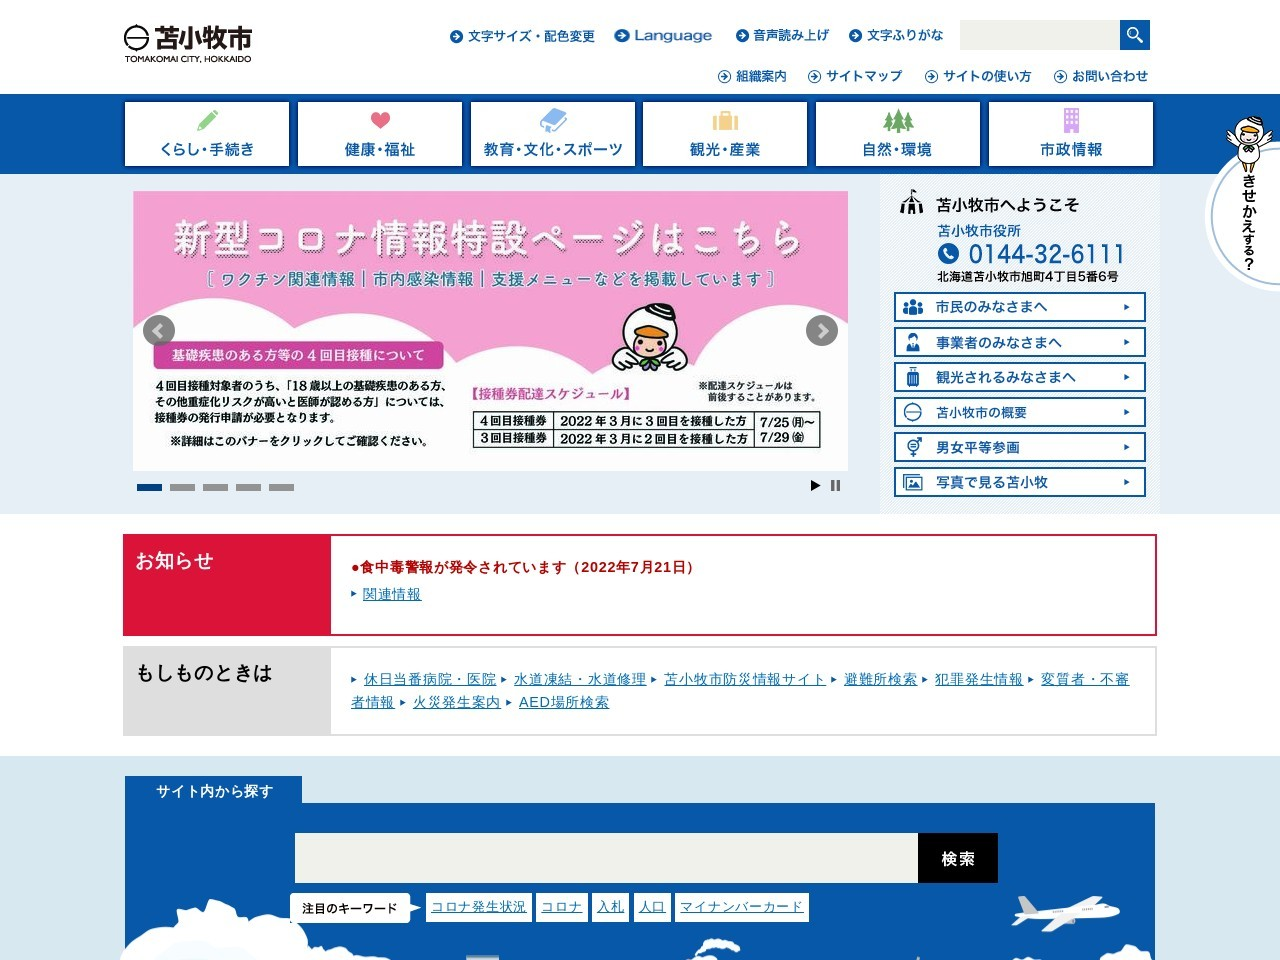 http://www.city.tomakomai.hokkaido.jp/kanko/kosho/rodokoyo/iot.html